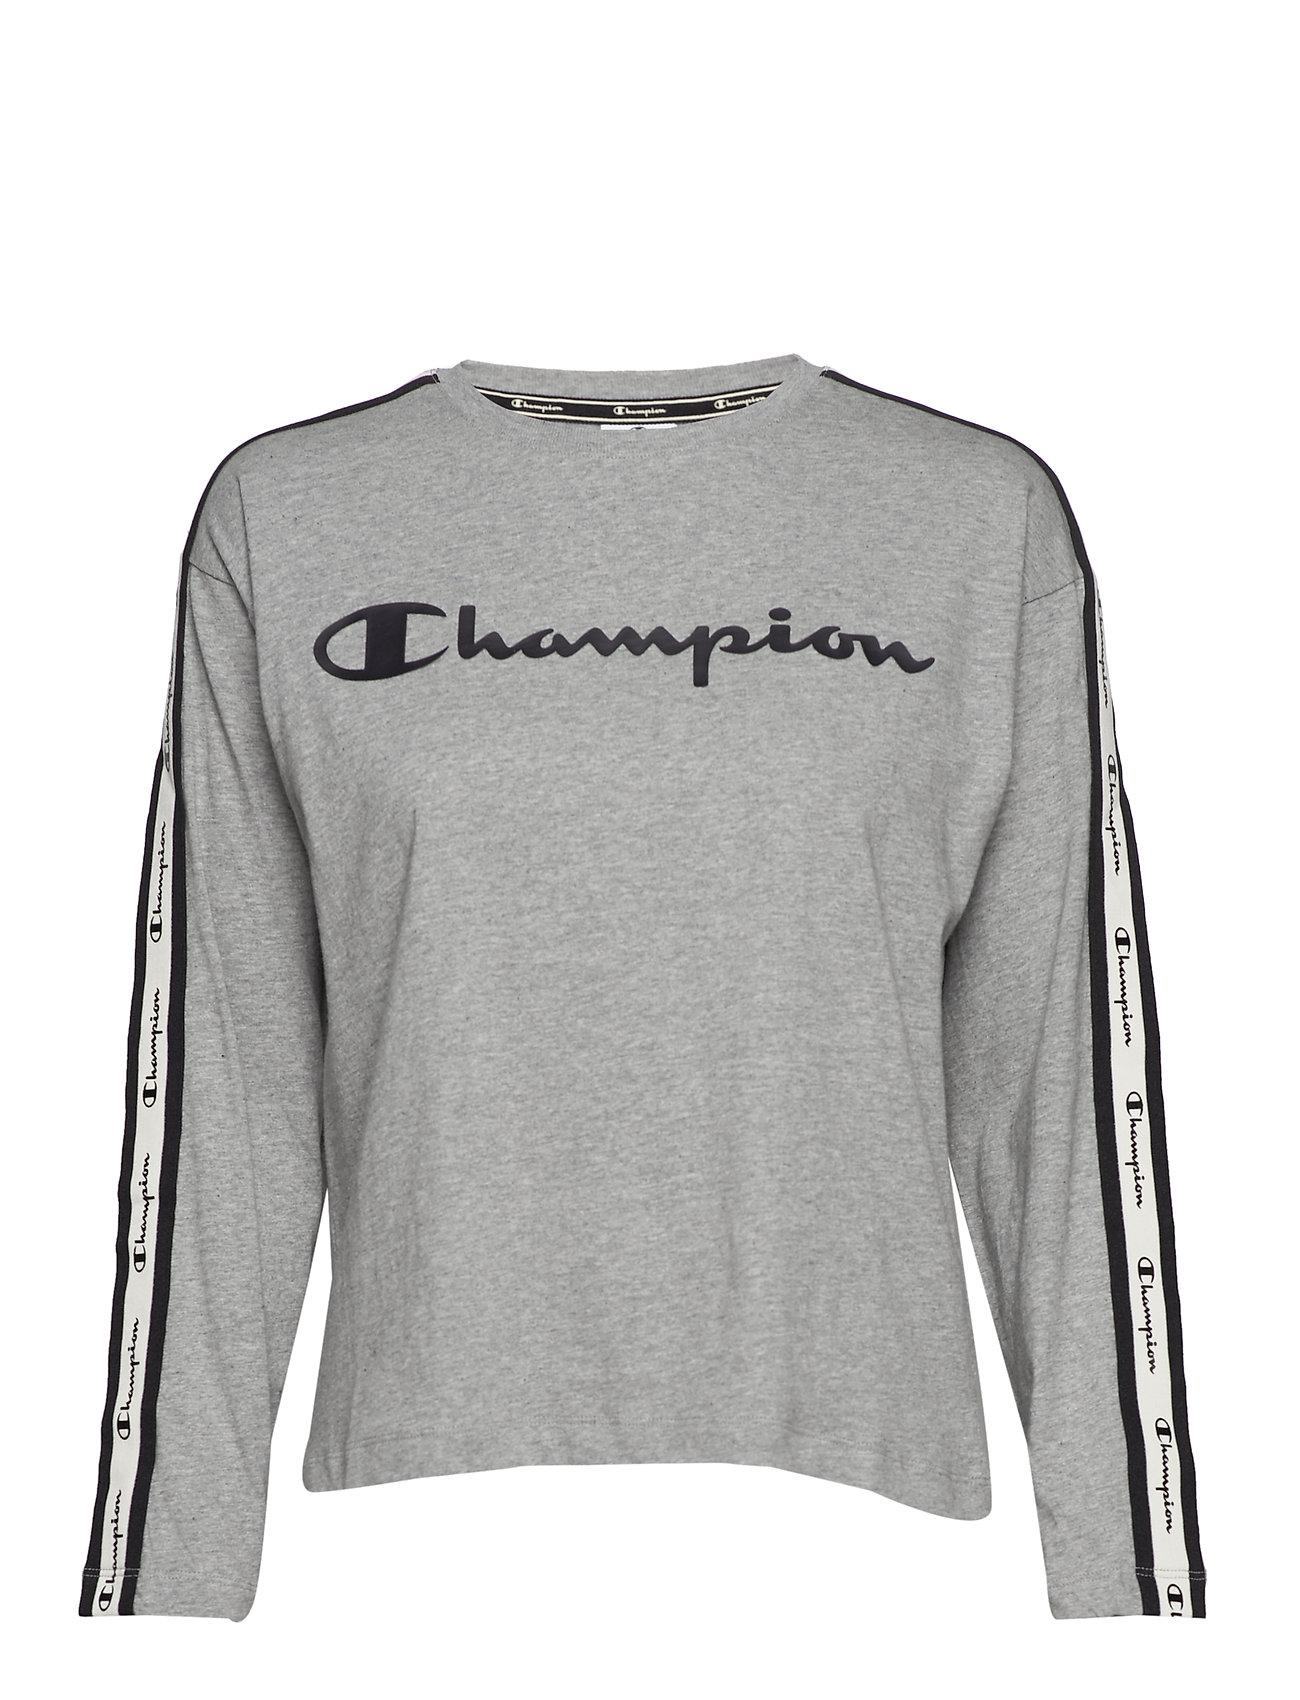 Champion Long Sleeve T-Shirt - GRAY MELANGE LIGHT